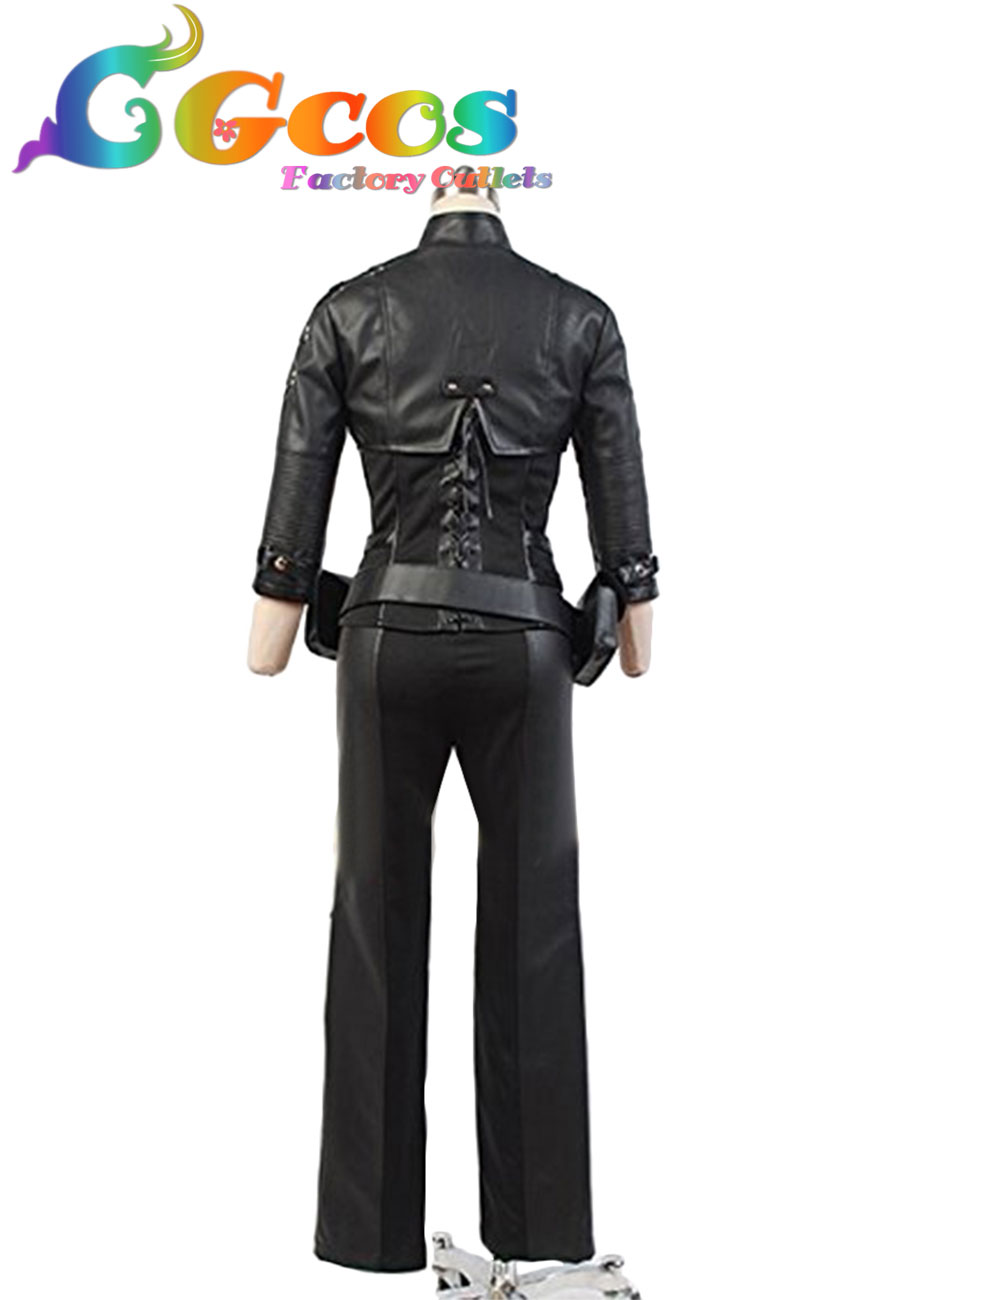 Green Arrow Black Canary Sara Lance Cosplay Costume Uniform Full Set In Stock